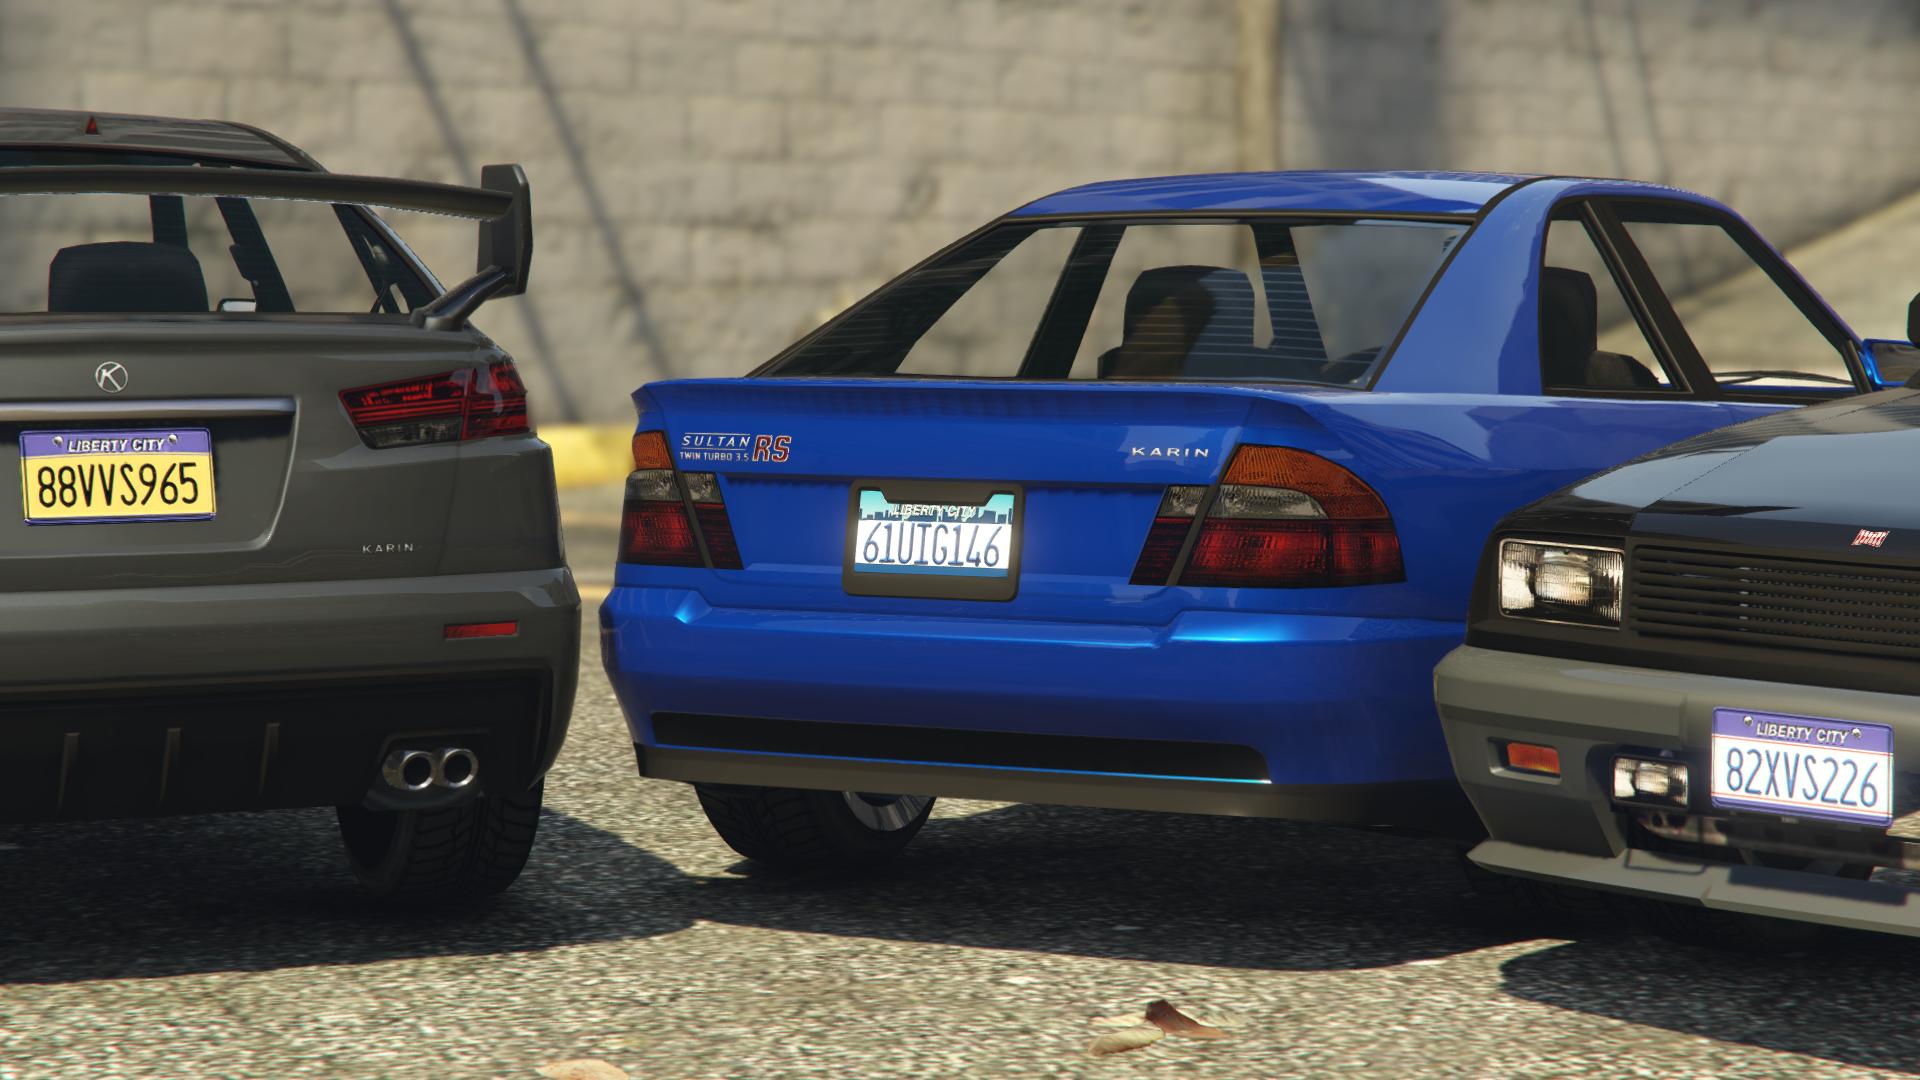 New License Plates Add On Gta5 Mods Com Images, Photos, Reviews